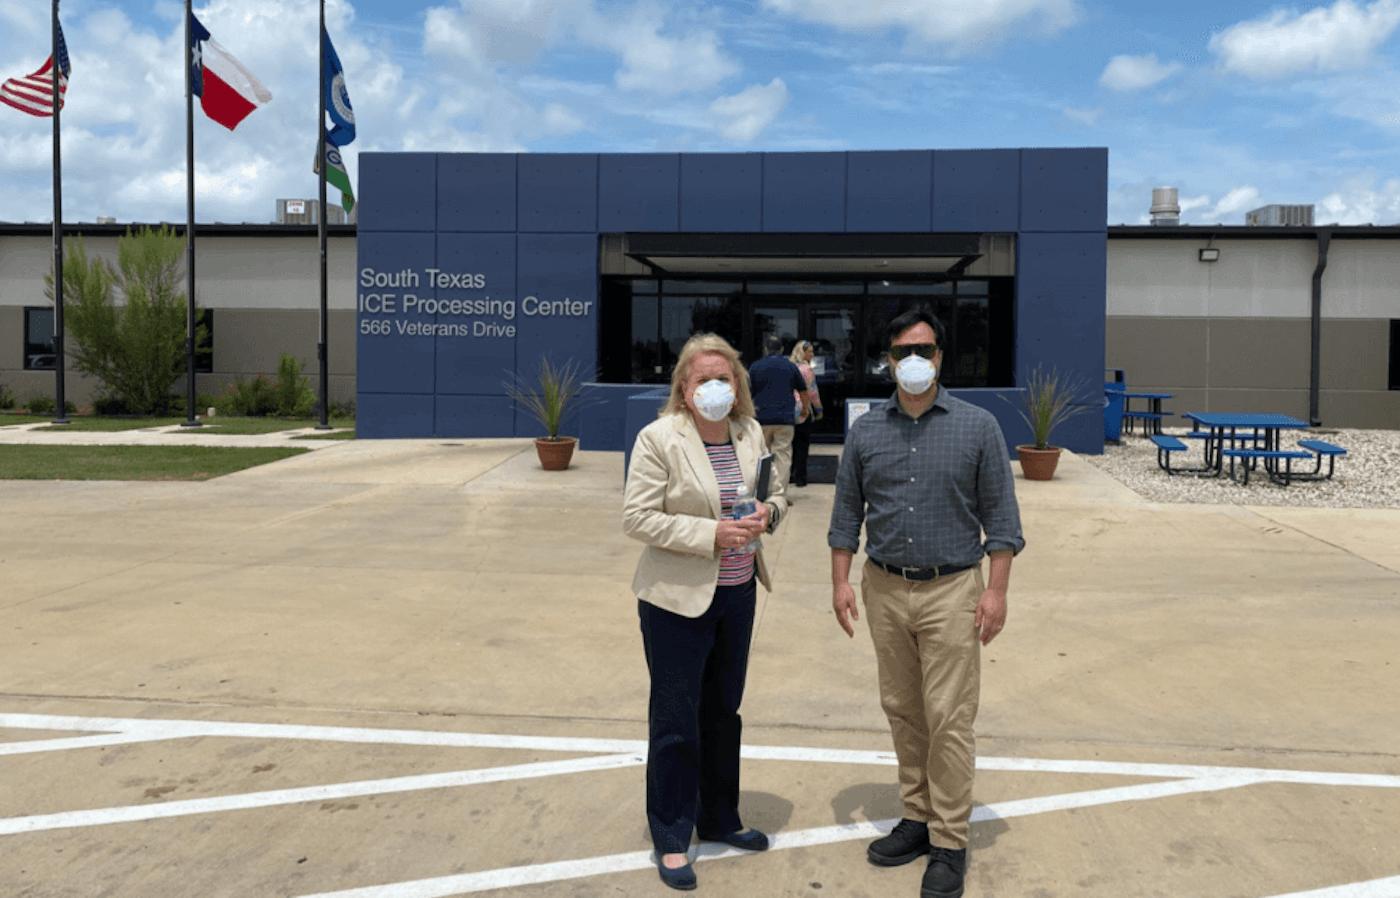 latino-congress-visit-detention-centers